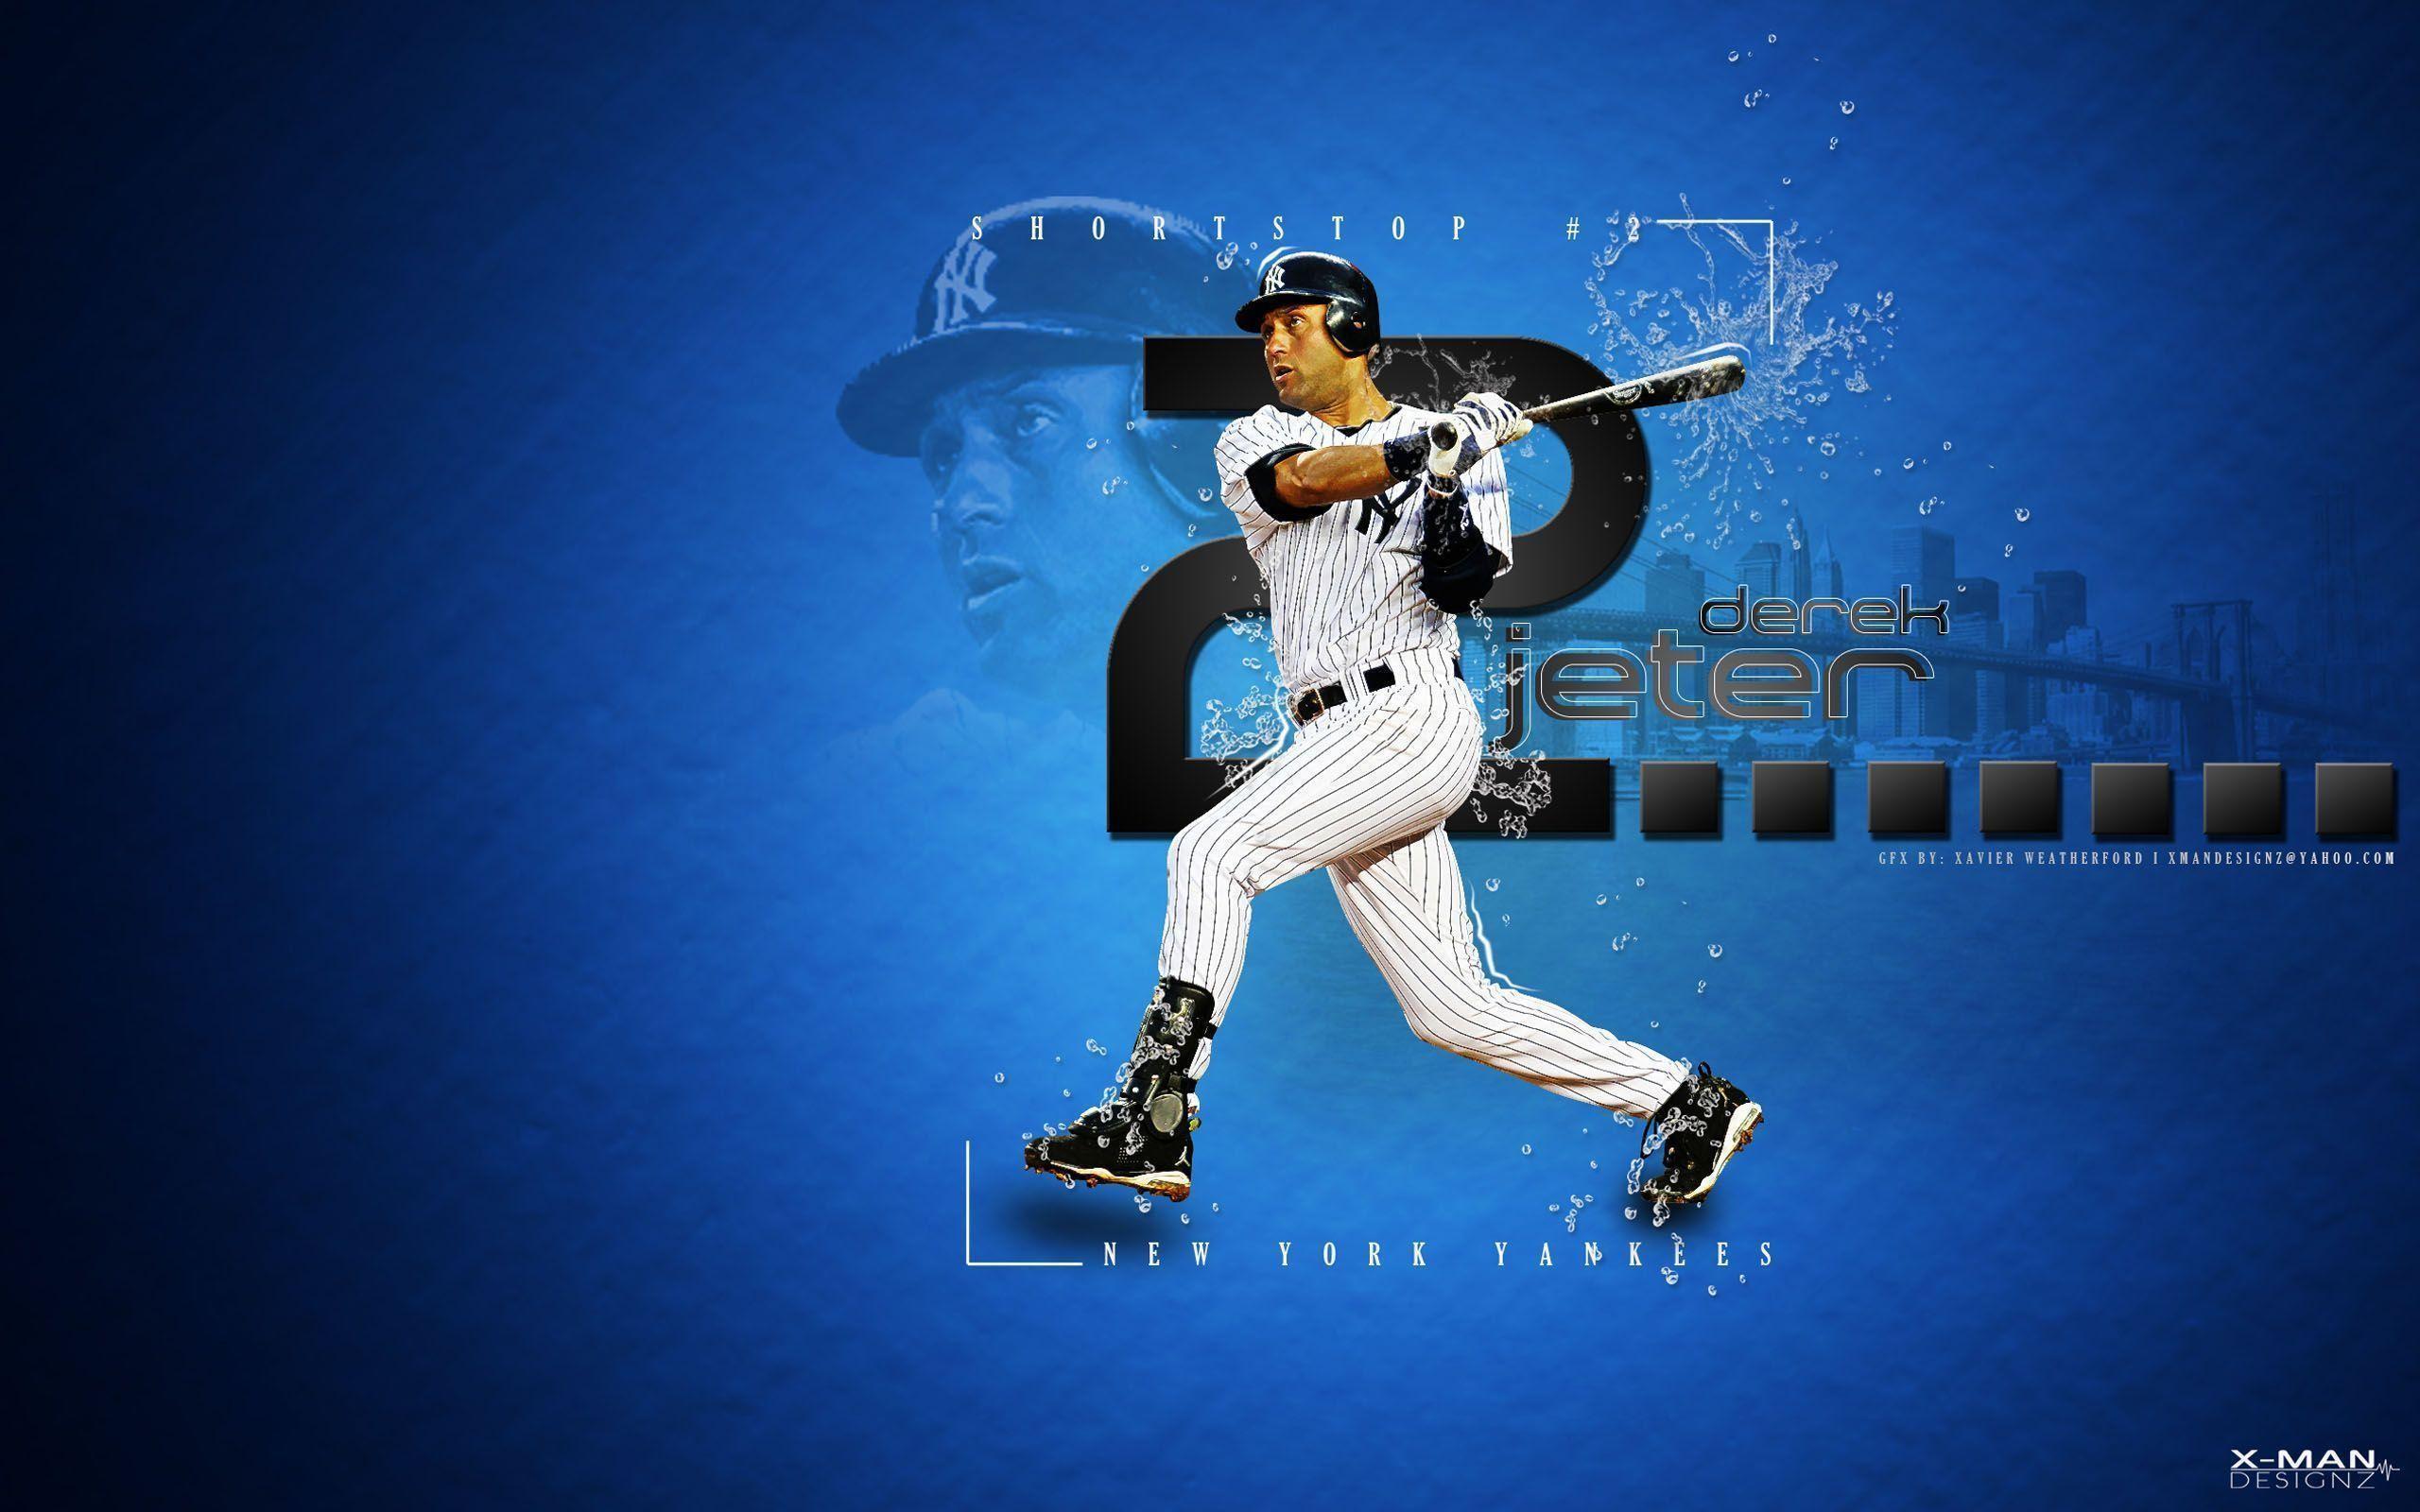 Derek Jeter New York Yankees wallpaper